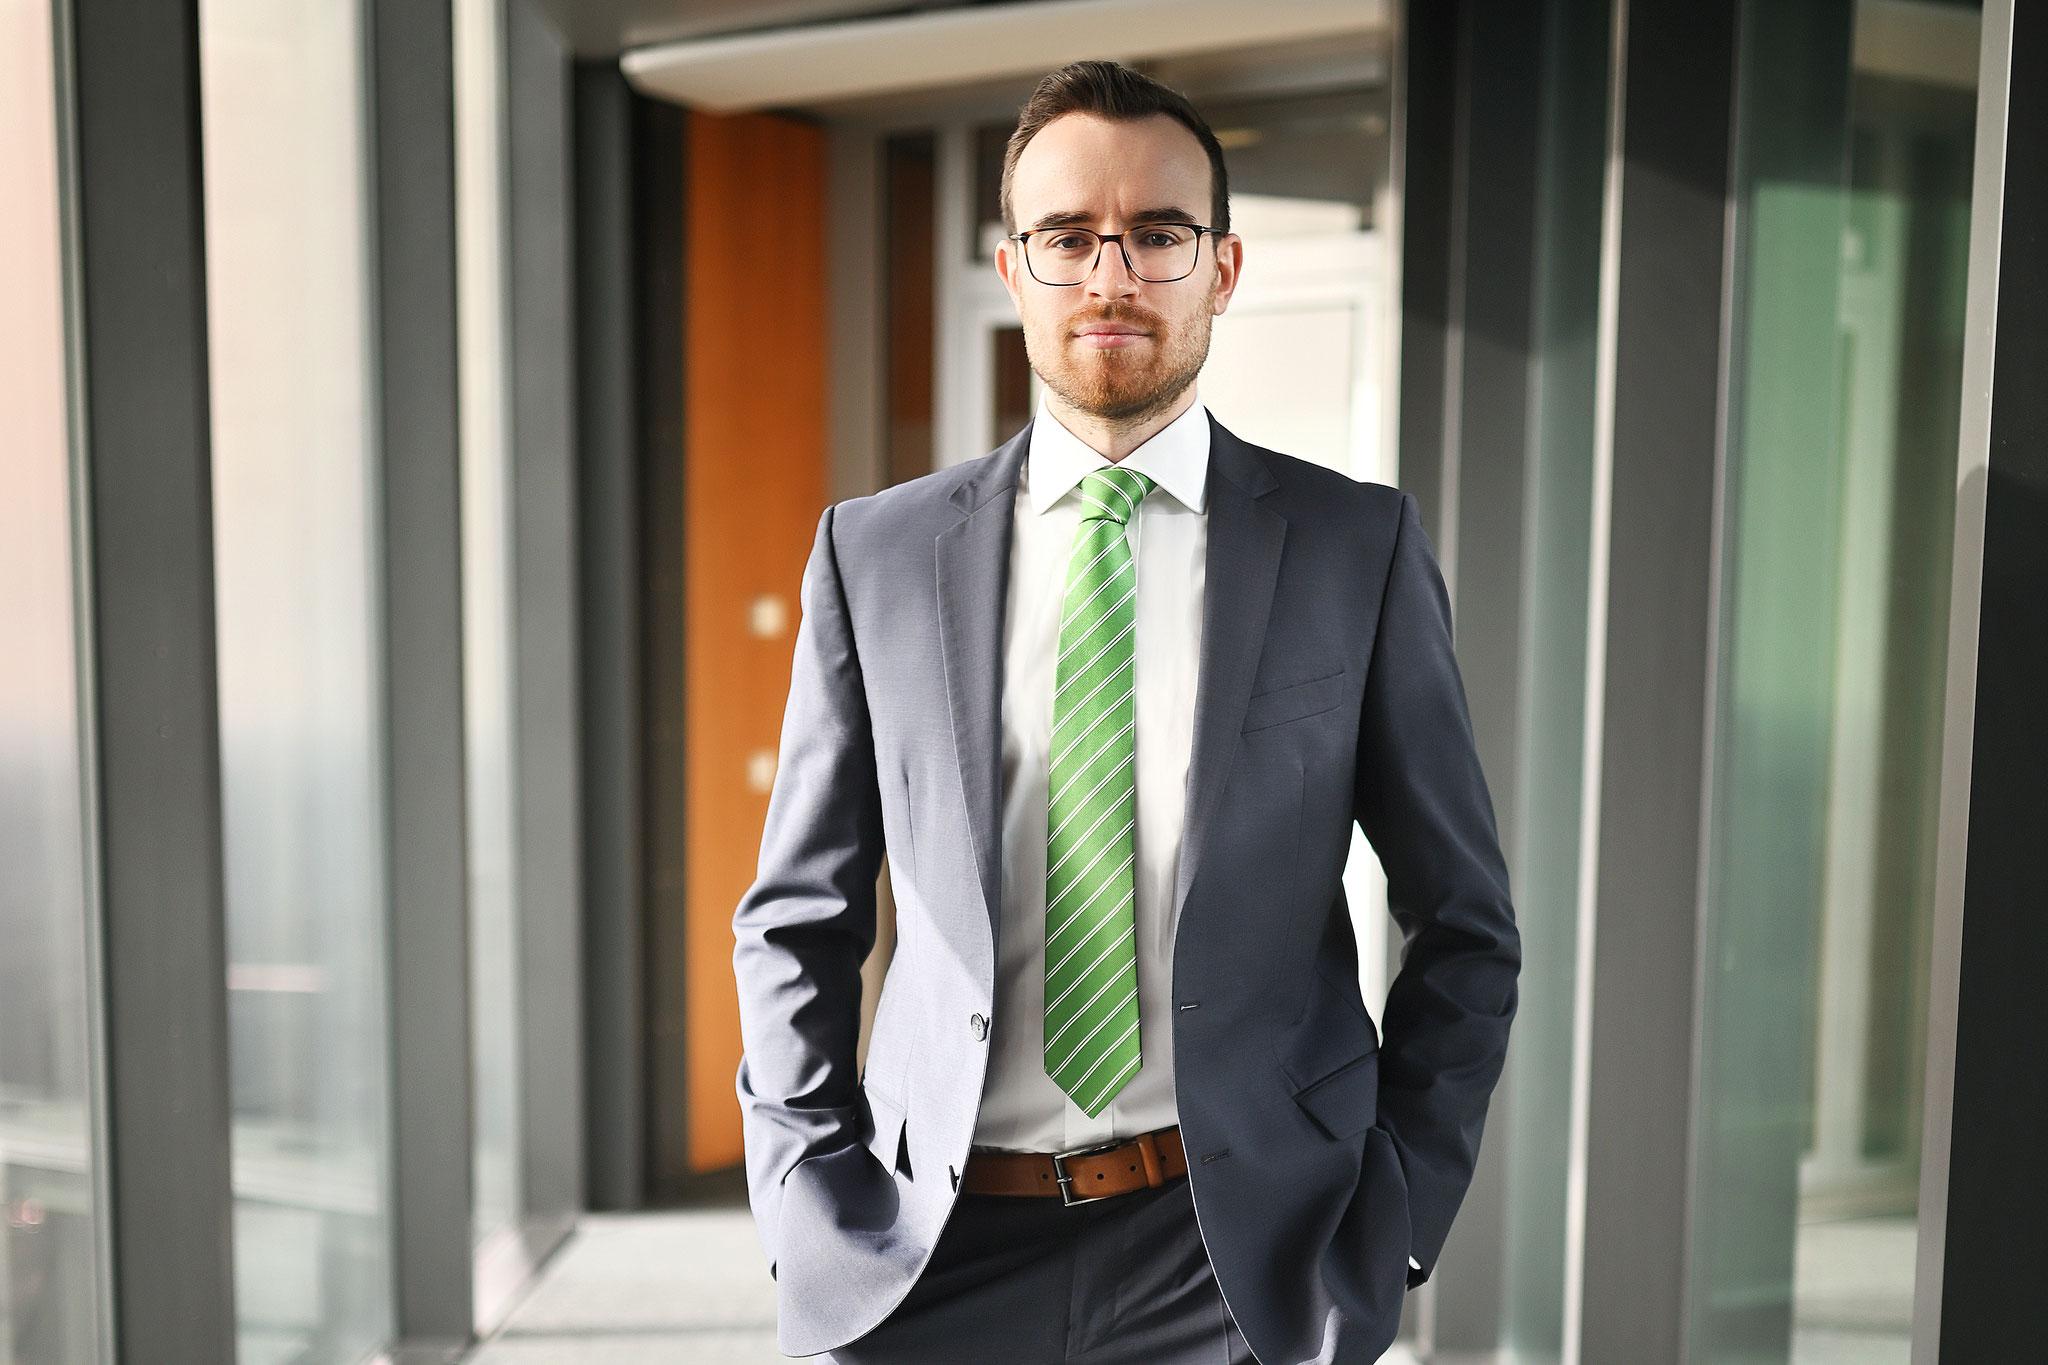 E+H | Eisenberger + Herzog | Rechtsanwalt aus den eigenen Reihen